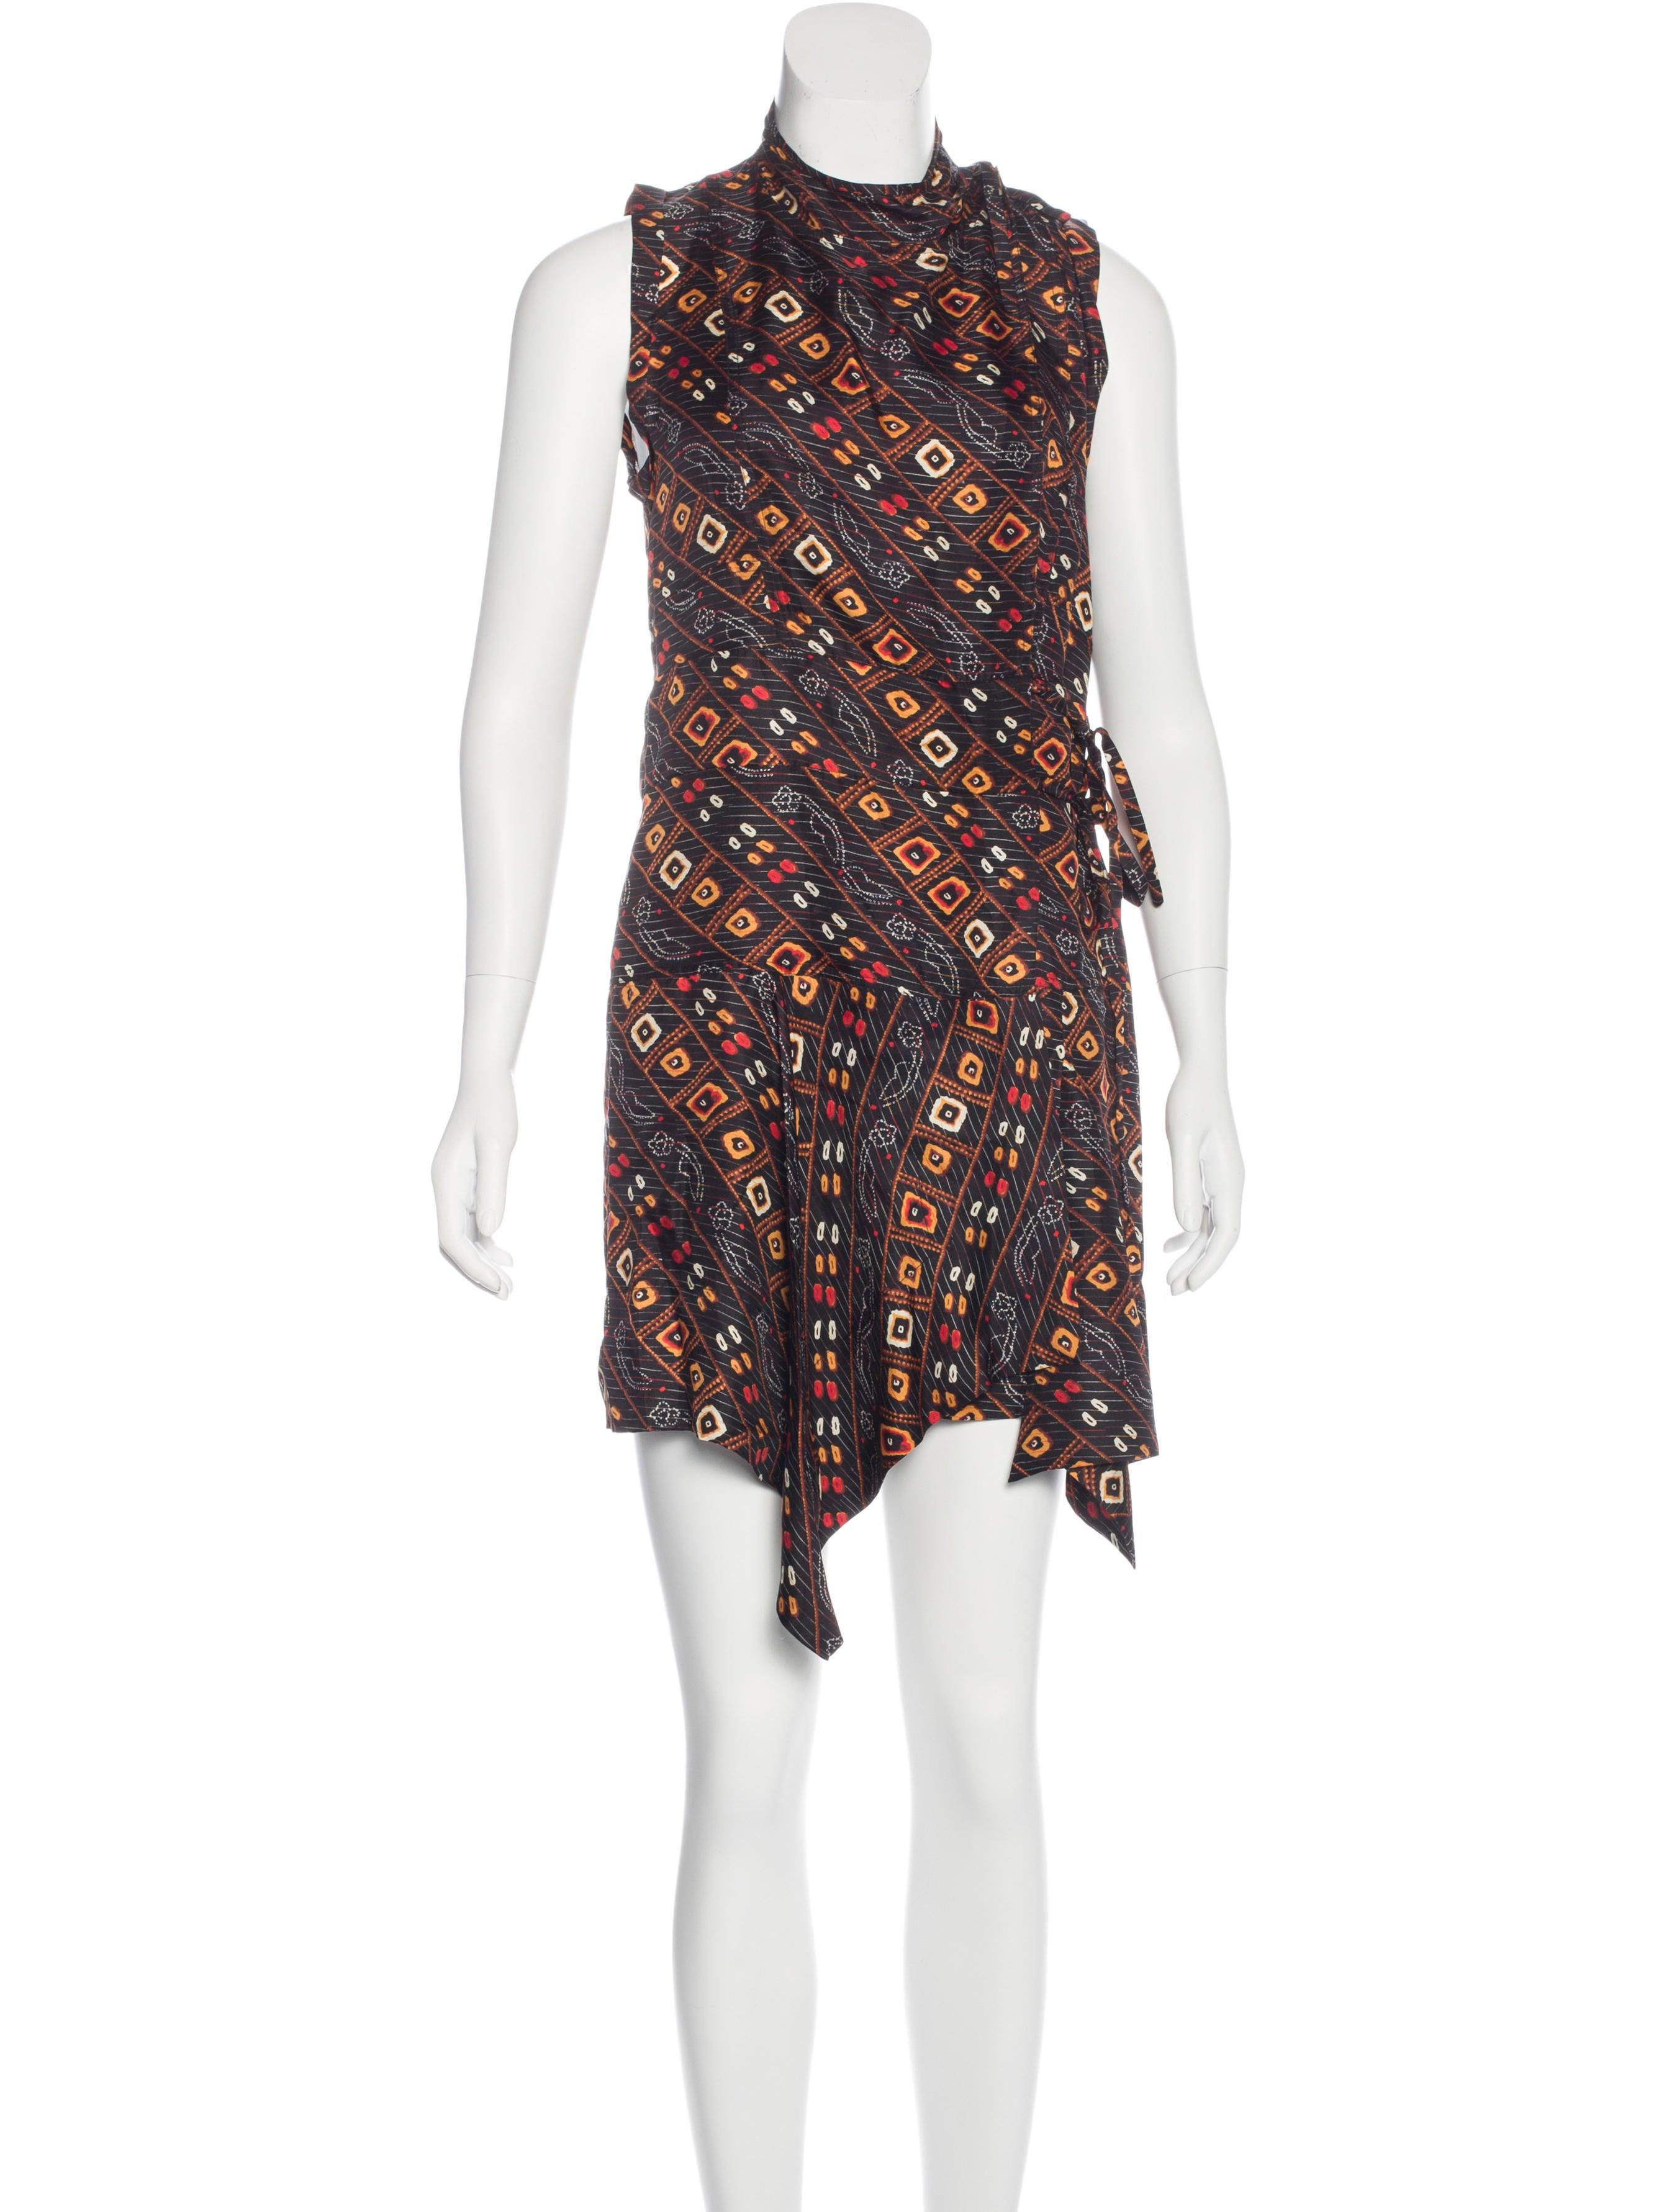 Isabel marant silk abstract print dress clothing for Isabel marant shirt dress